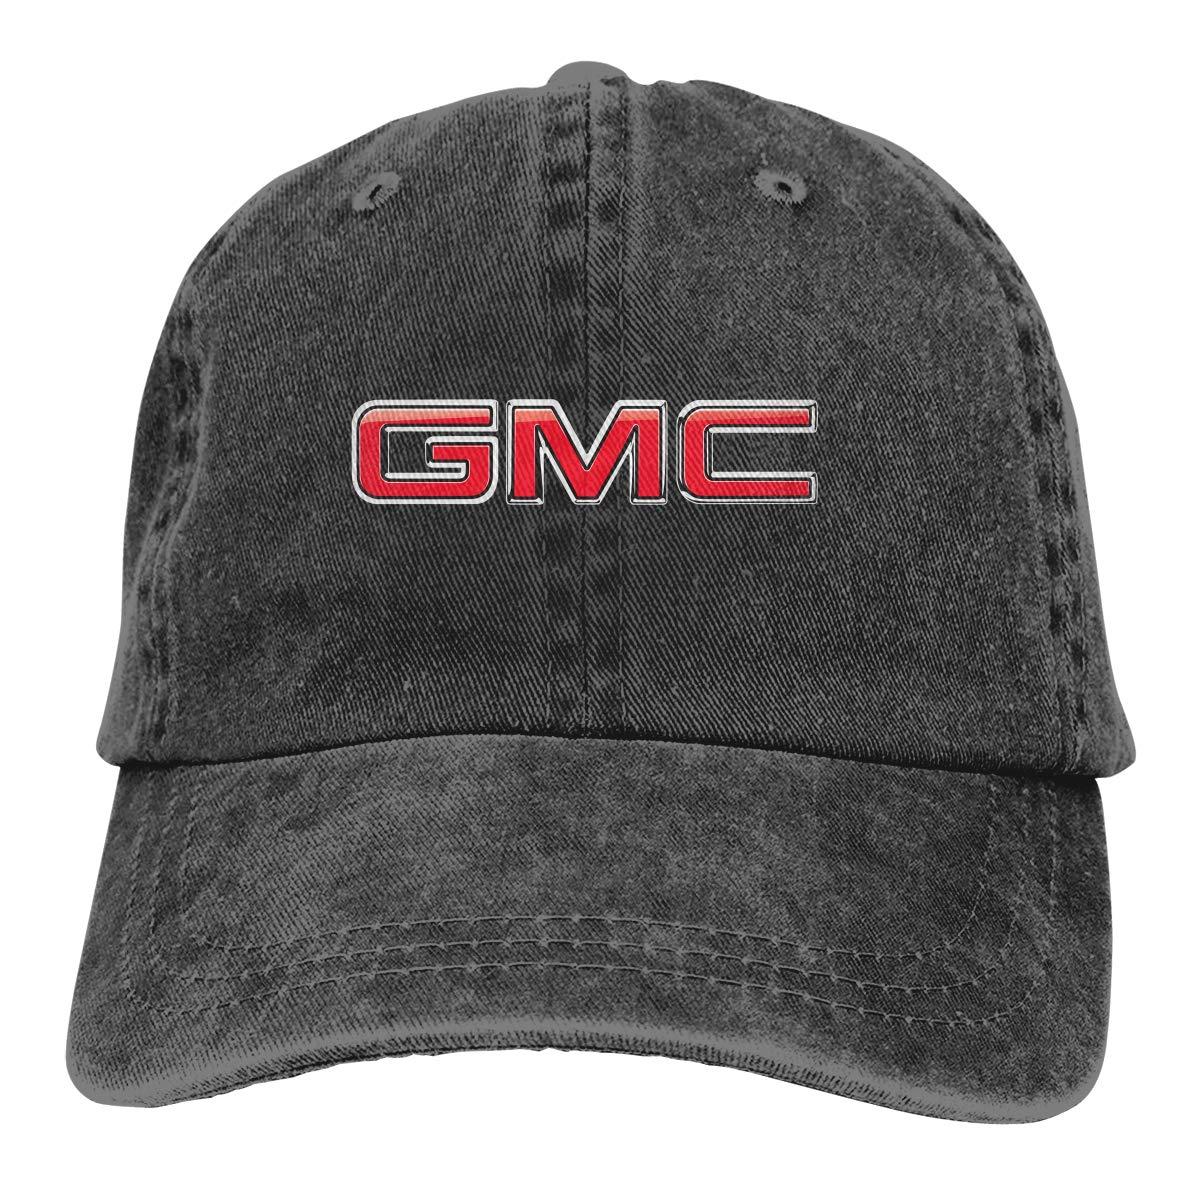 KLA2000 Denim Baseball Caps G-M-C Trucks Adult Vintage Washed Cotton Hats